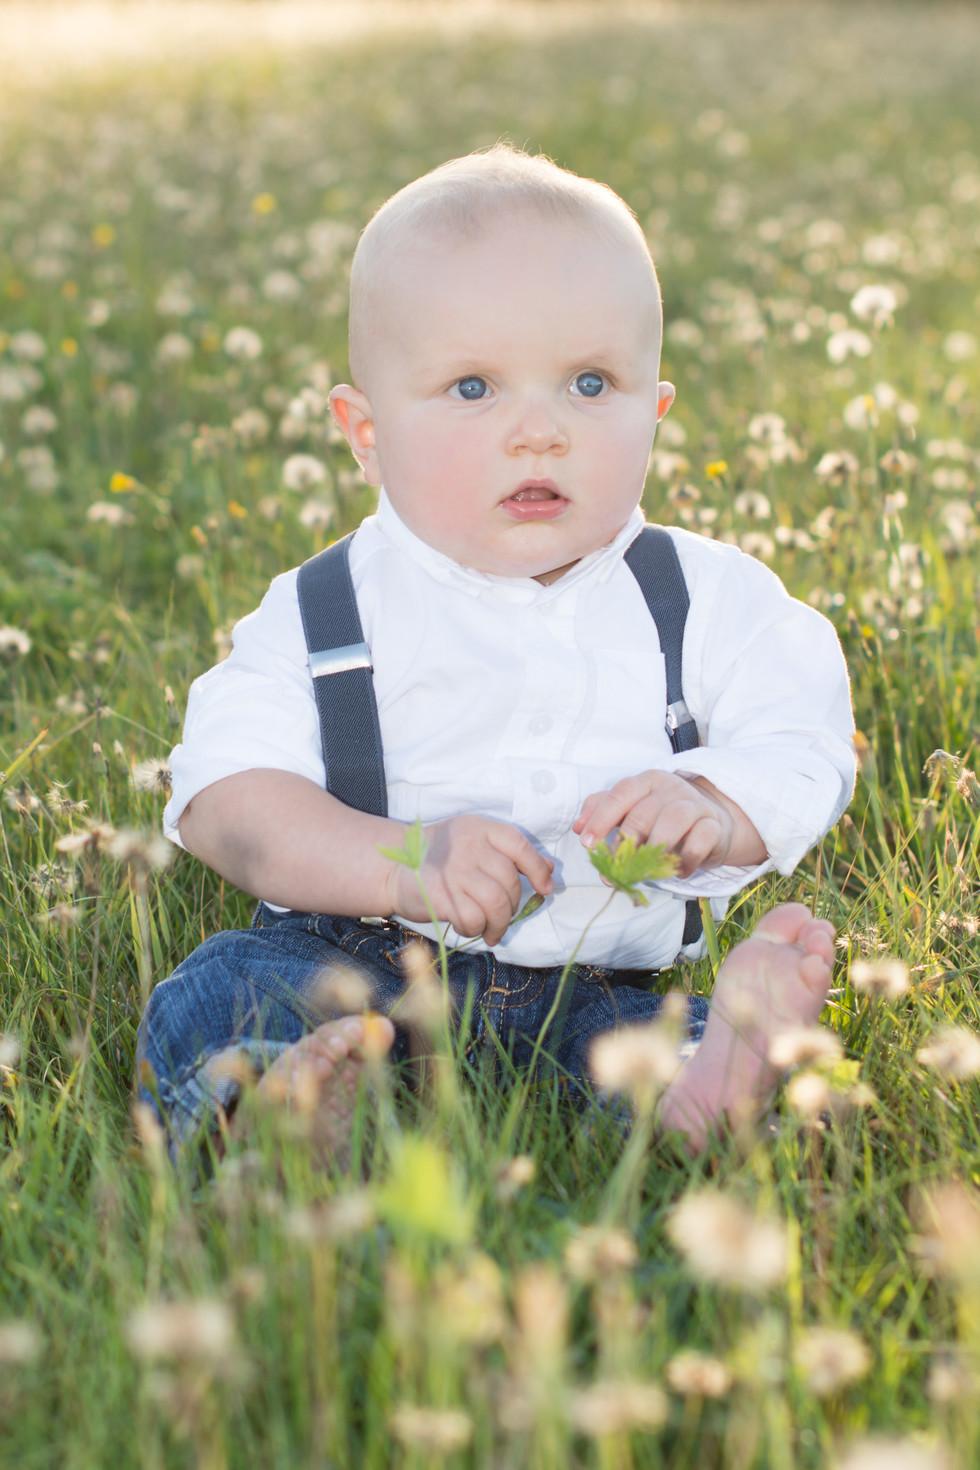 baby-outdoor-keepsake-amanda-starr